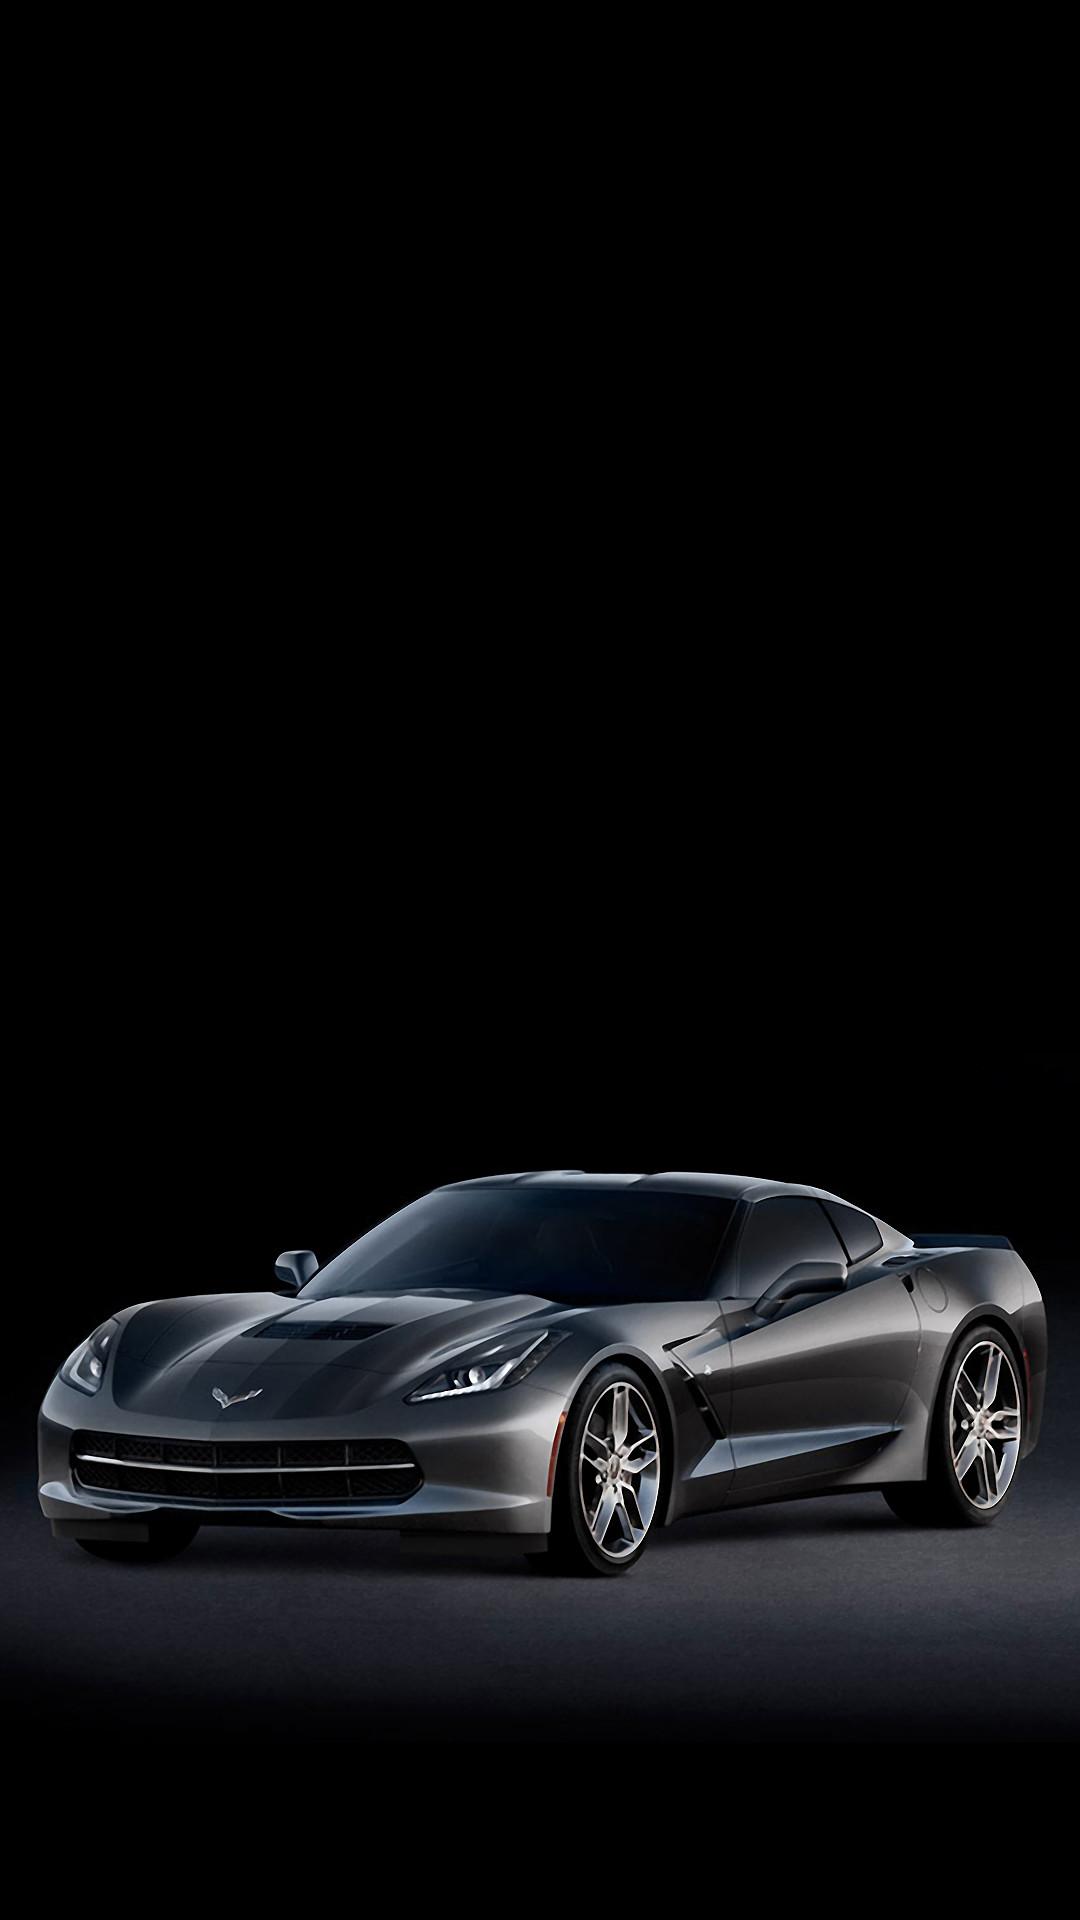 C7 Corvette Stingray Side #iPhone #7 #wallpaper